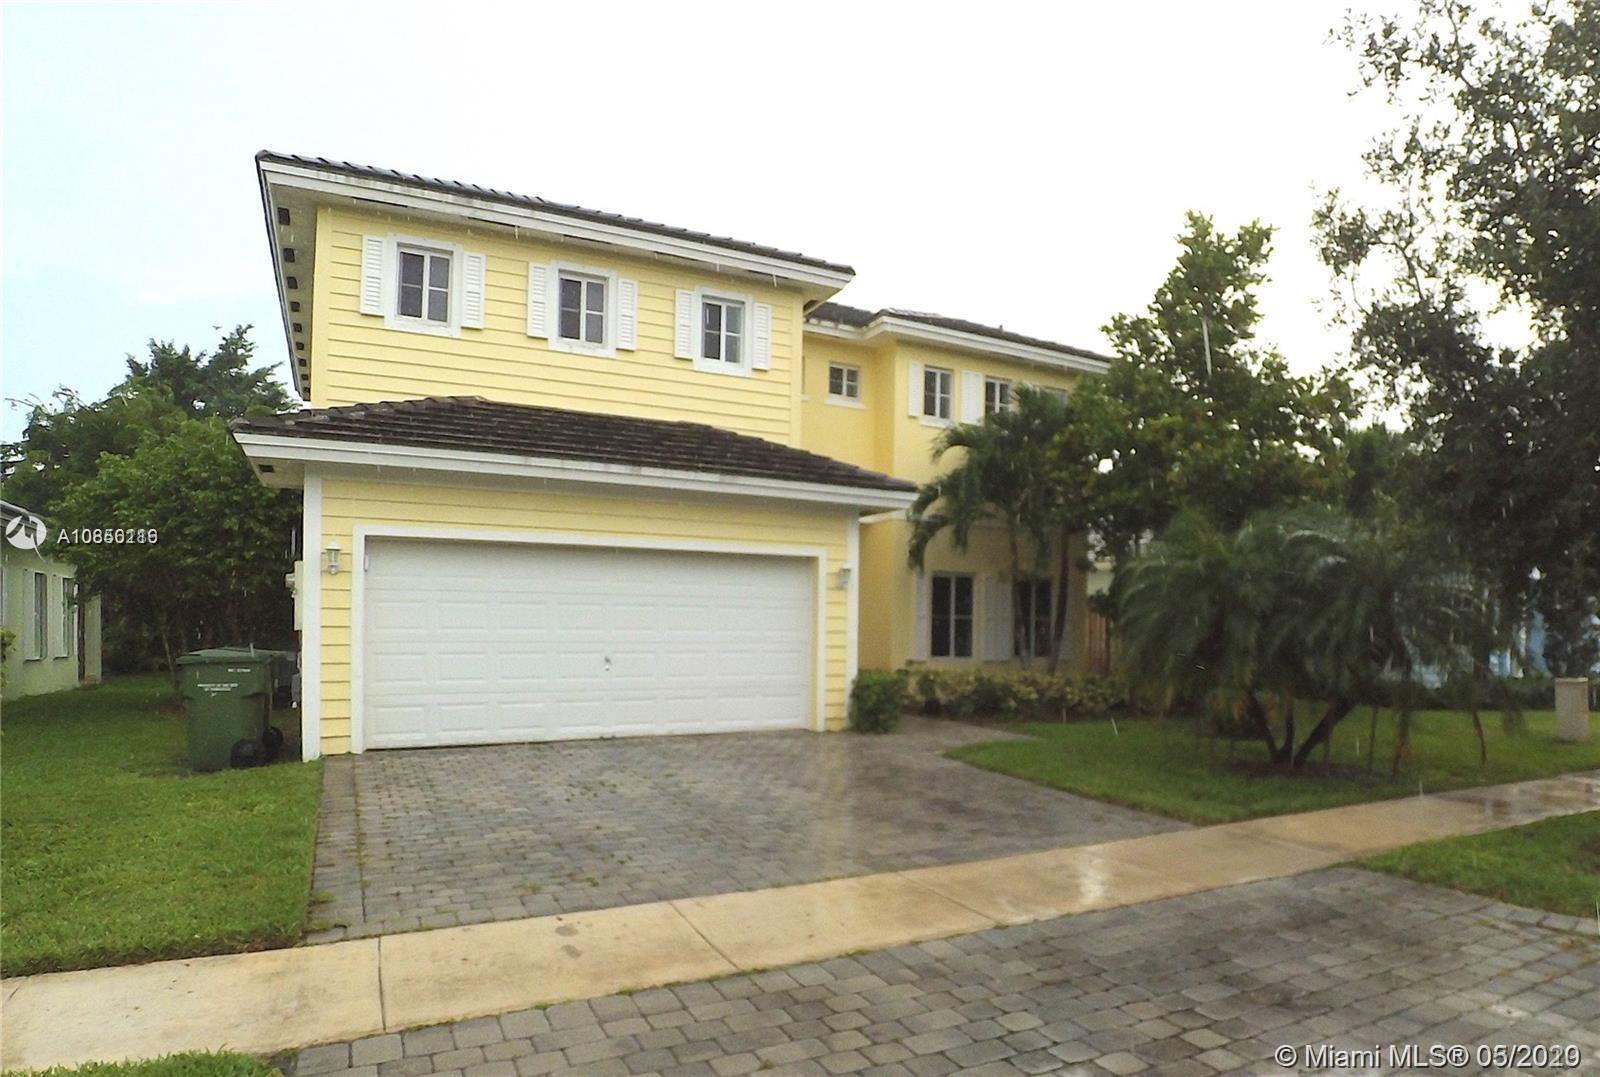 2866 NE 4th St, Homestead, FL 33033 - Homestead, FL real estate listing